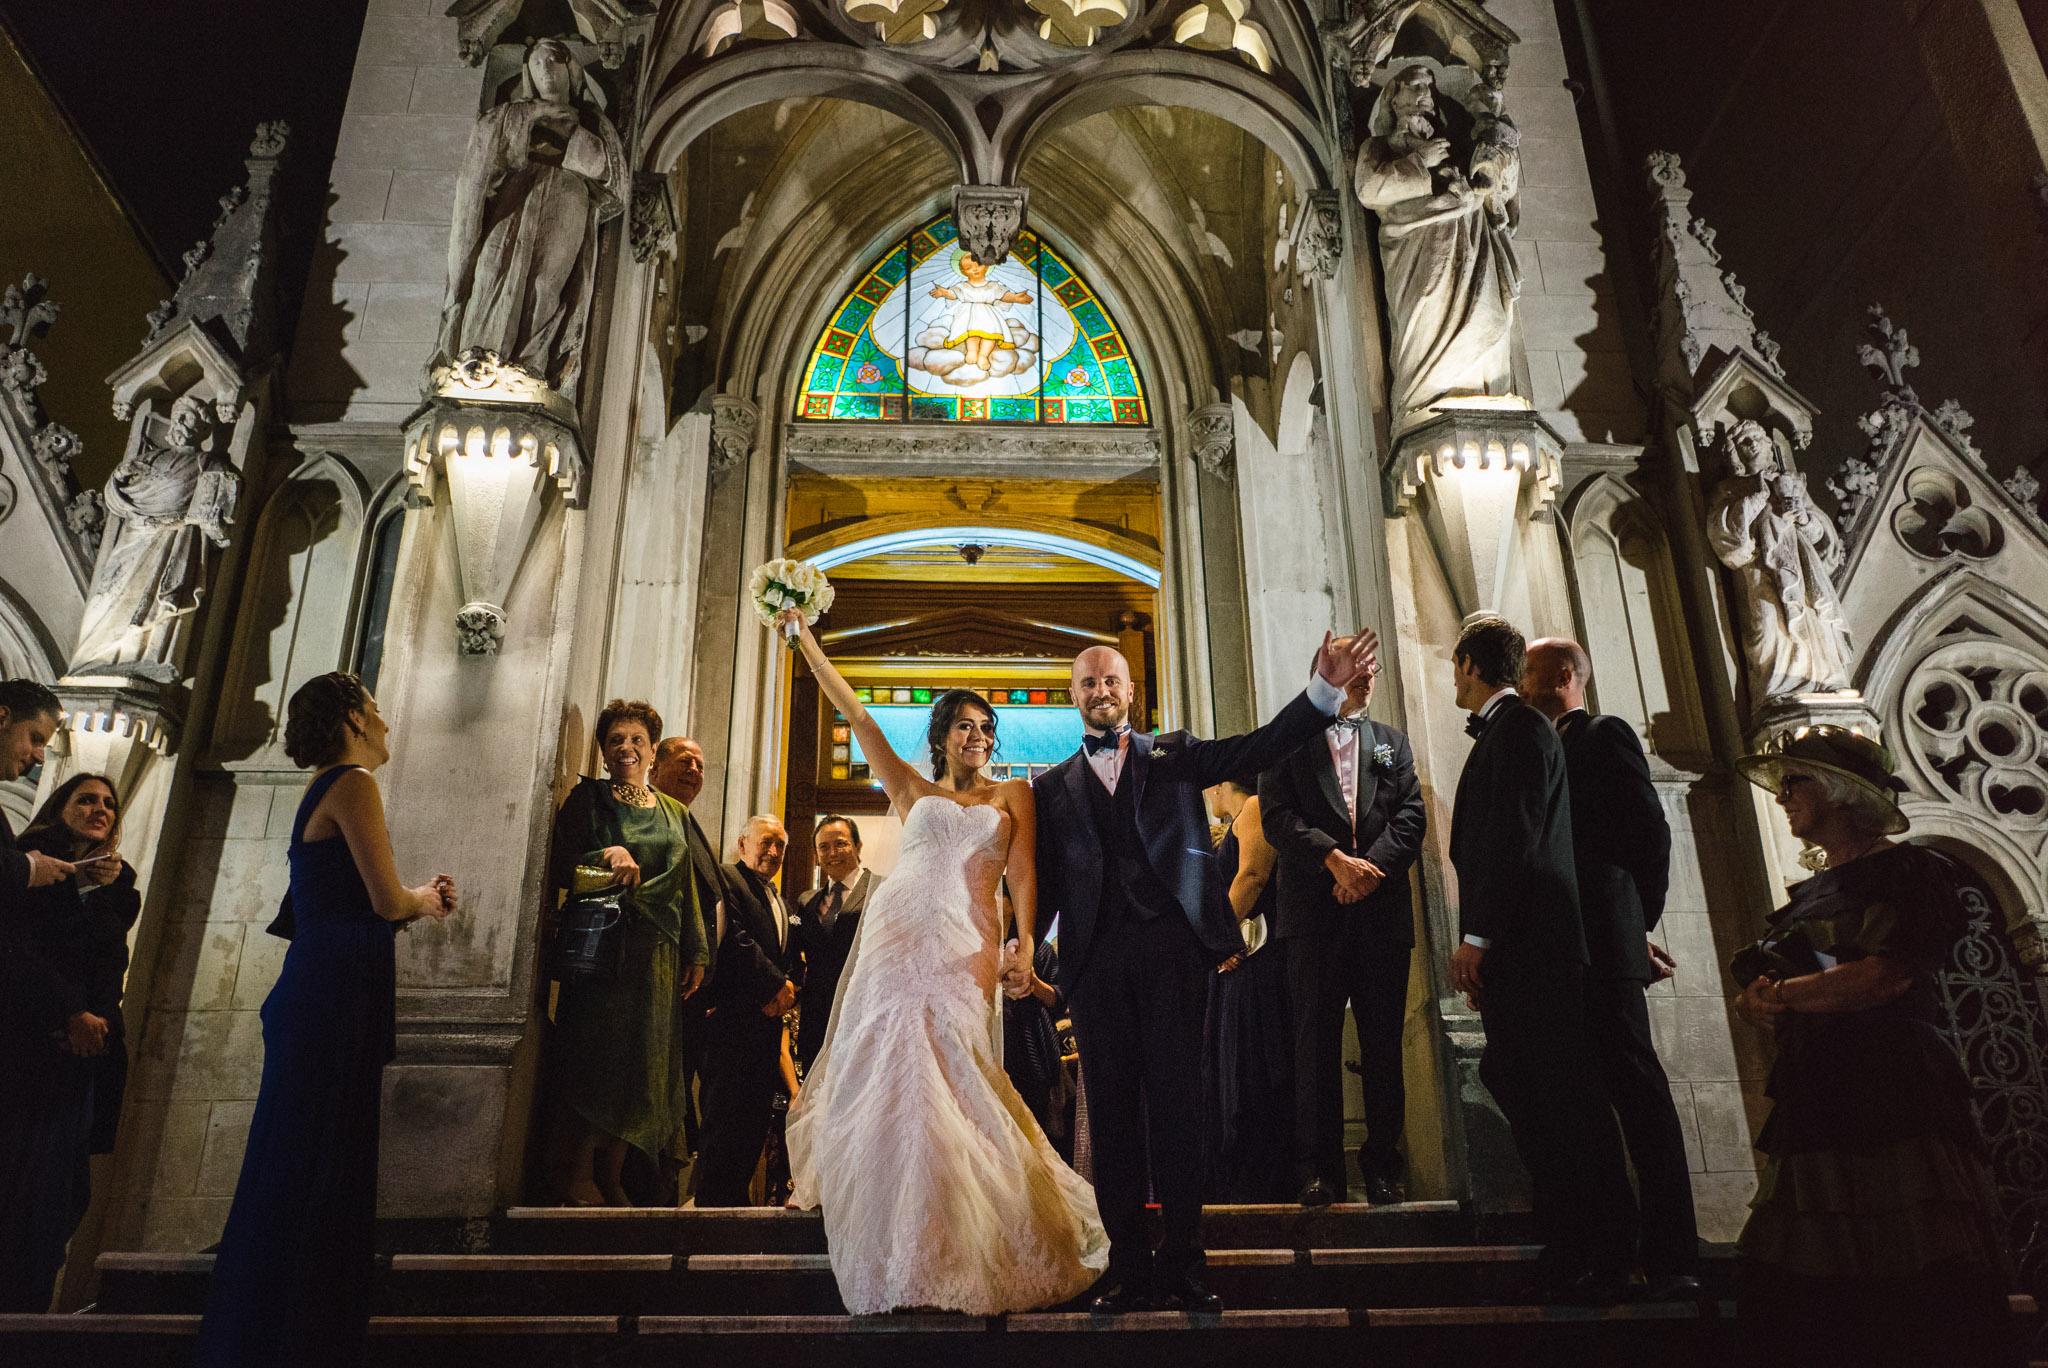 ©www.mauriziosolisbroca.com-20161001maurizio-solis-broca-mexico-canada-wedding-photographer20161001DSC05083-Edit.jpg